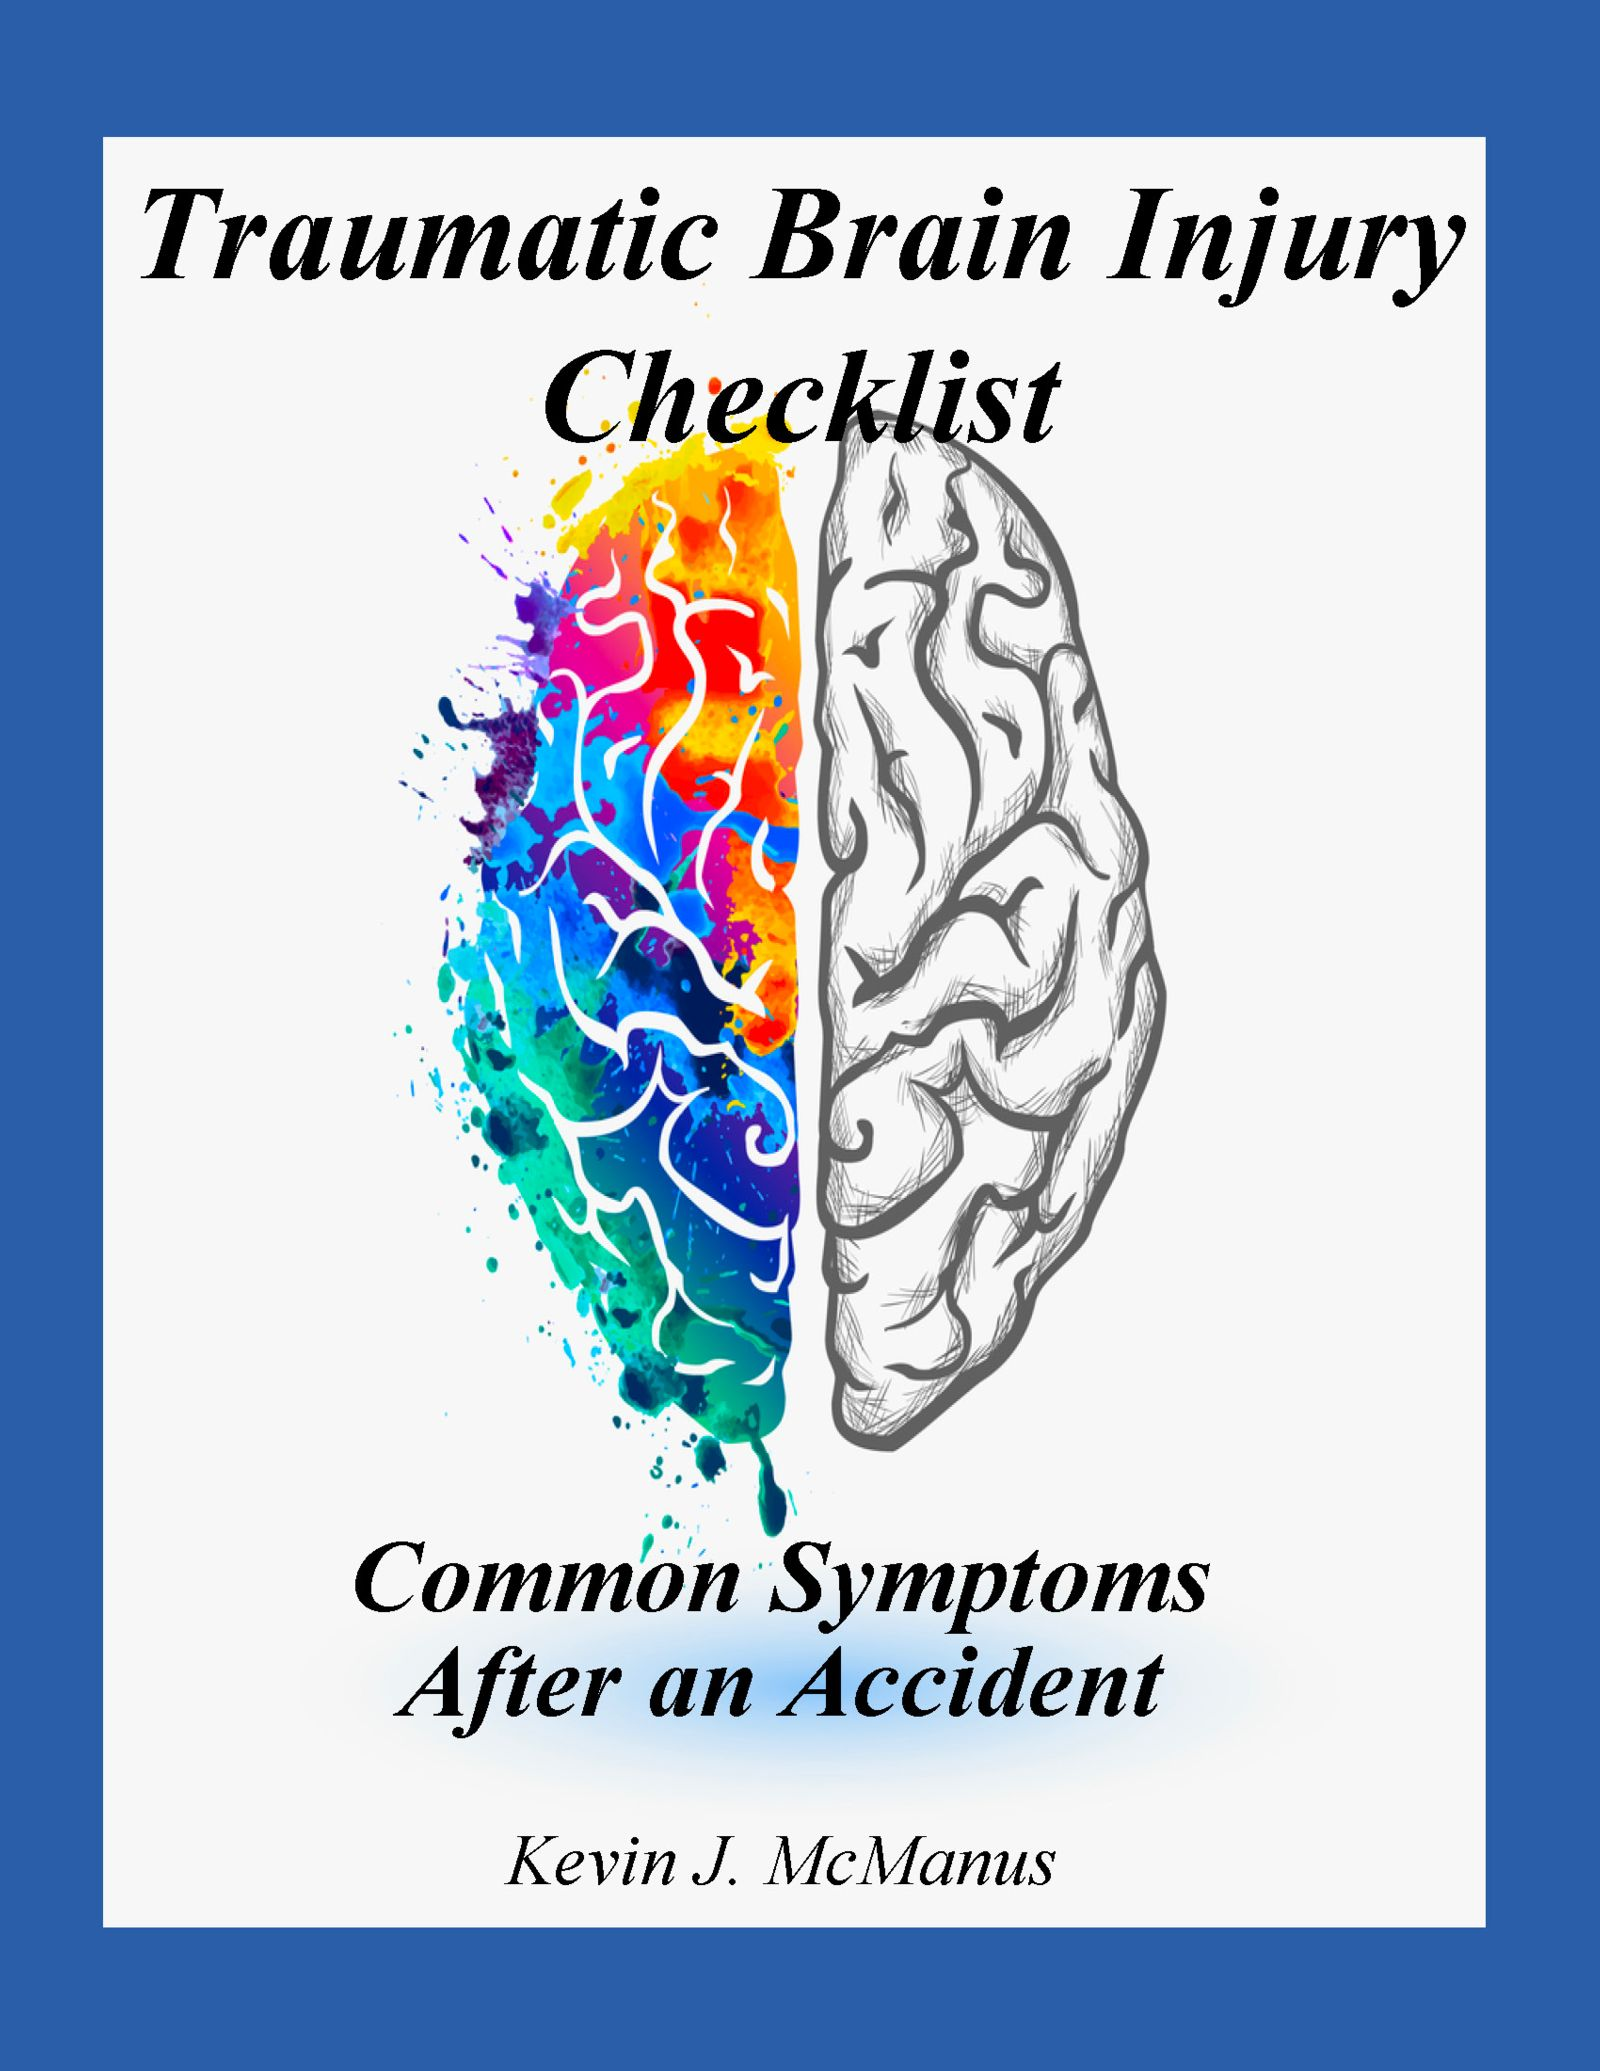 brain injury attorney in Kansas City, mo checklist for symptoms tbi